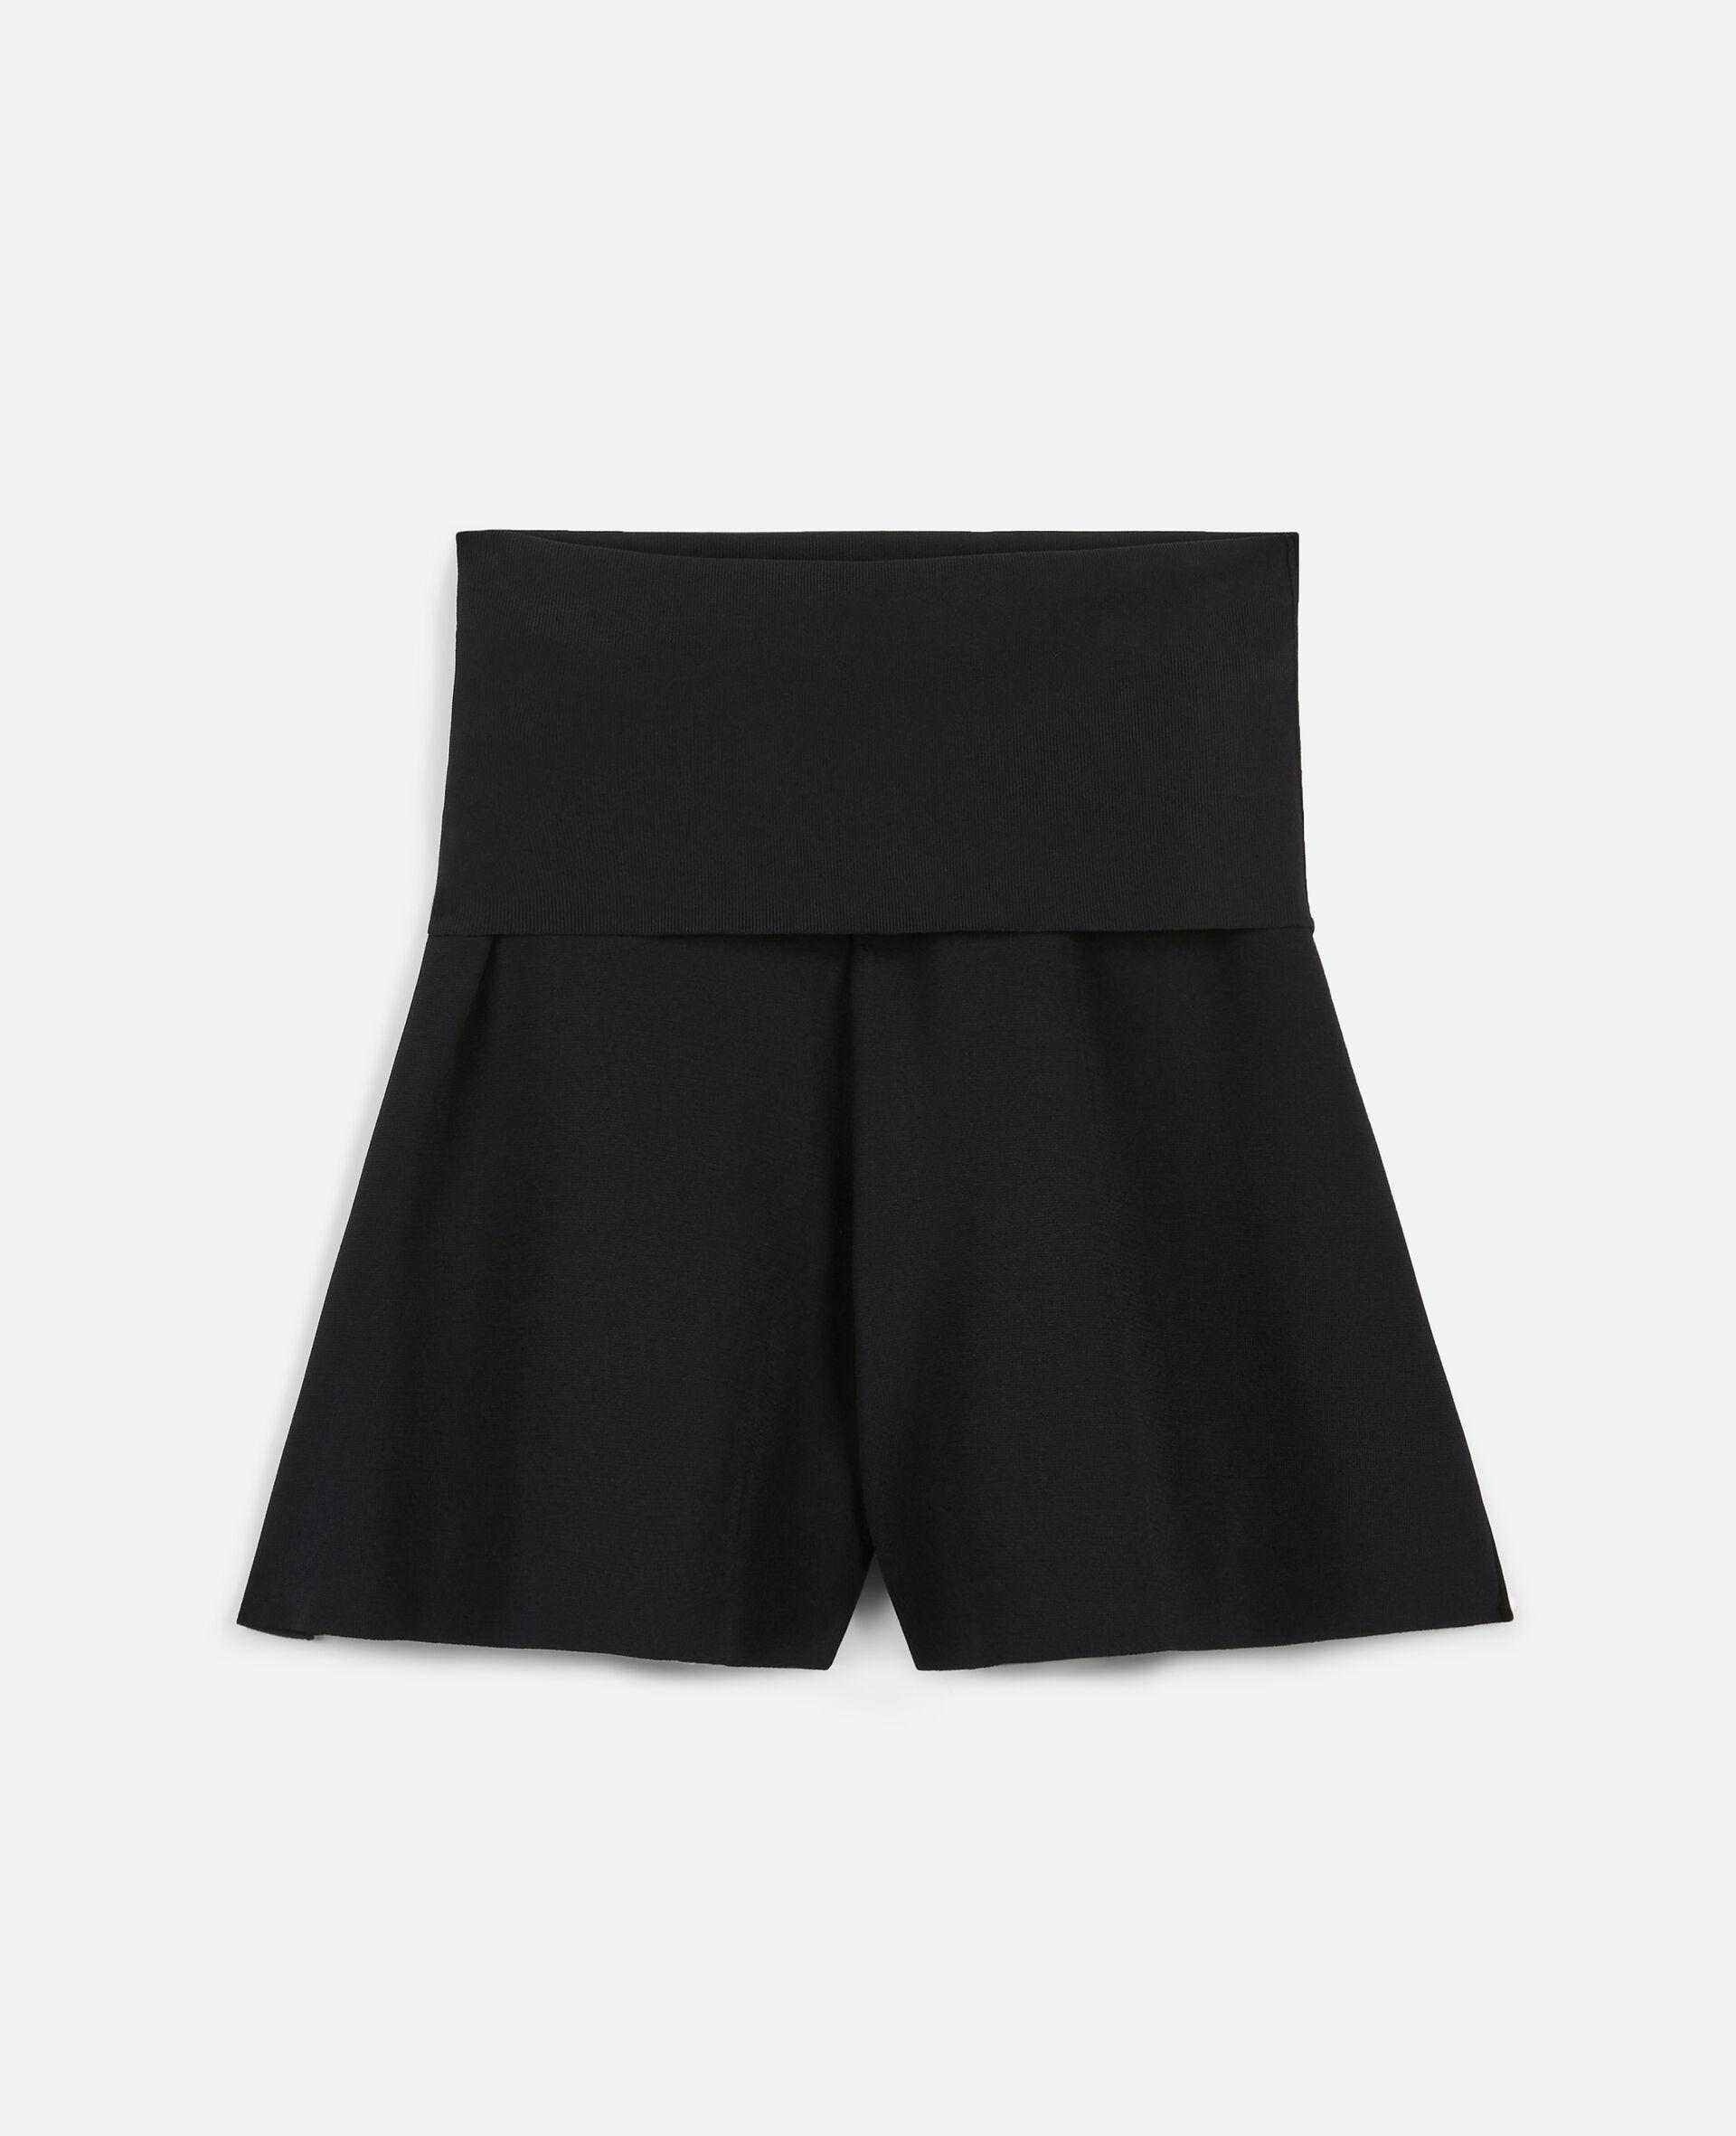 Shorts aus kompaktem Strick-Schwarz-large image number 0